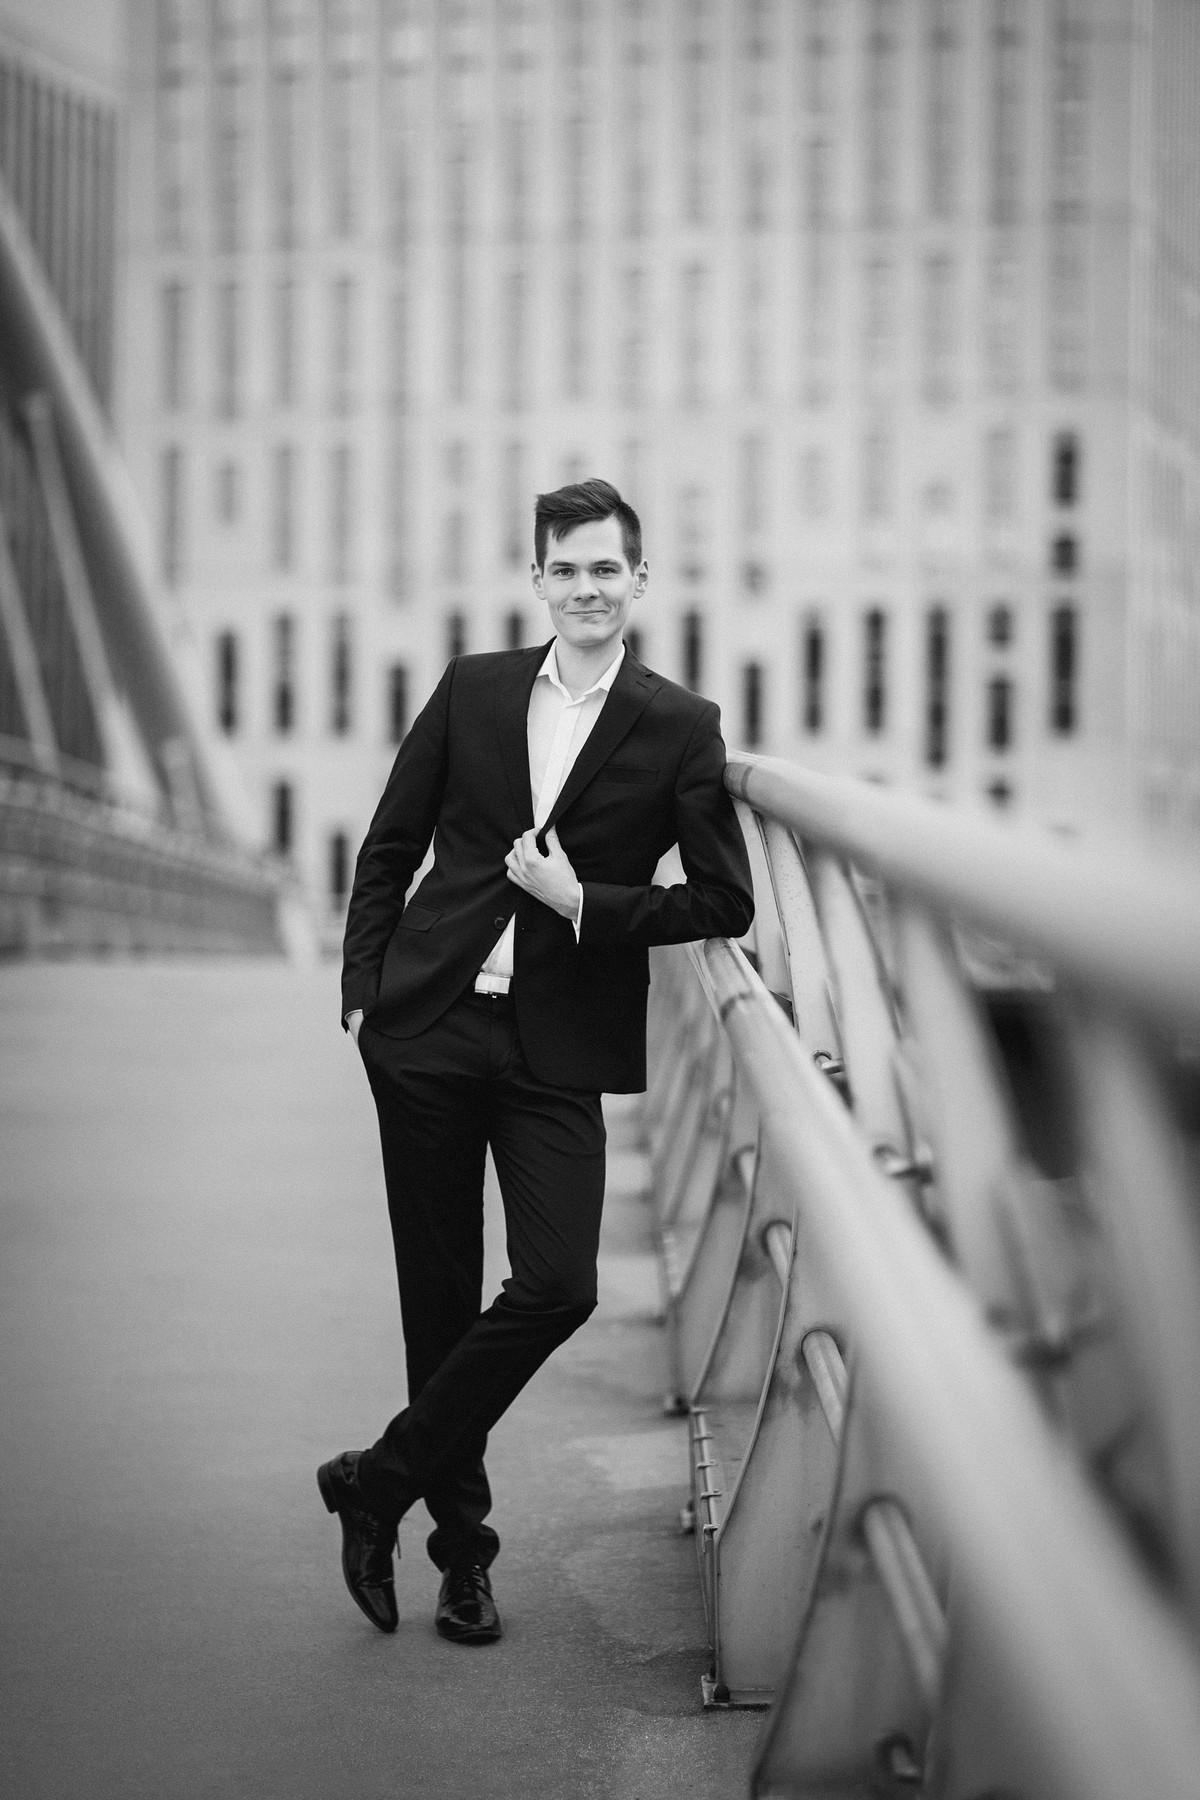 portret biznesowy bielsko, sesja do cv, portret do cv slask, zdjecia do cv bielsko, portret biznesowy bielsko, sesja biznesowa bielsko, fotografia wizerunkowa bielsko, fotografia czechowice, fotografia portretowa bielsko, sesja biznesowa katowice, zdjecia portretowe, fotografia ludzi,fotograf portretowy czechowice, Anna i Jacek Bieniek, fotografia portretowa bielsko, fotograf ludzi slask, fotografia reklamowa bielsko, fotografia reklamowa bielsko, fotografia ludzi, fotograf korporacyjny, fotograf czechowice, fotografia bielsko, zdjecia slask, www.magiaobrazu.com